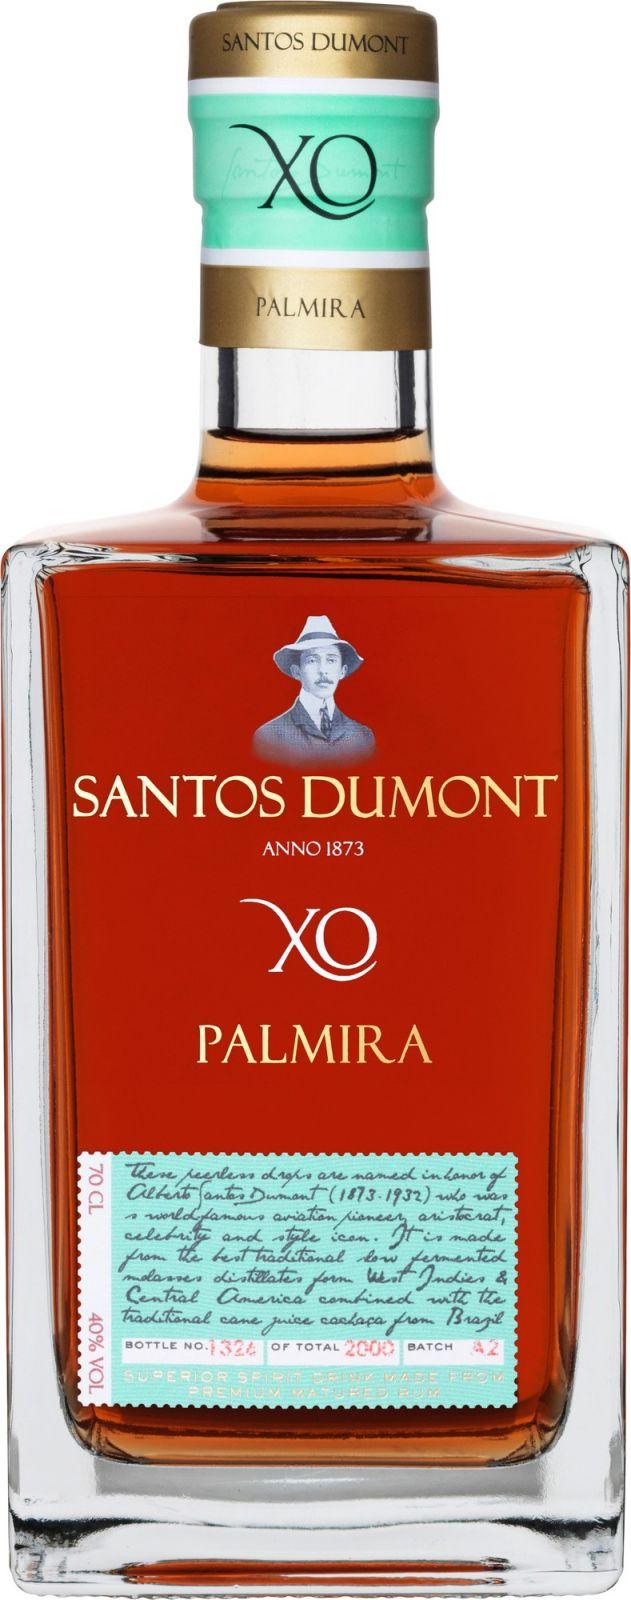 Santos Dumont XO Palmira